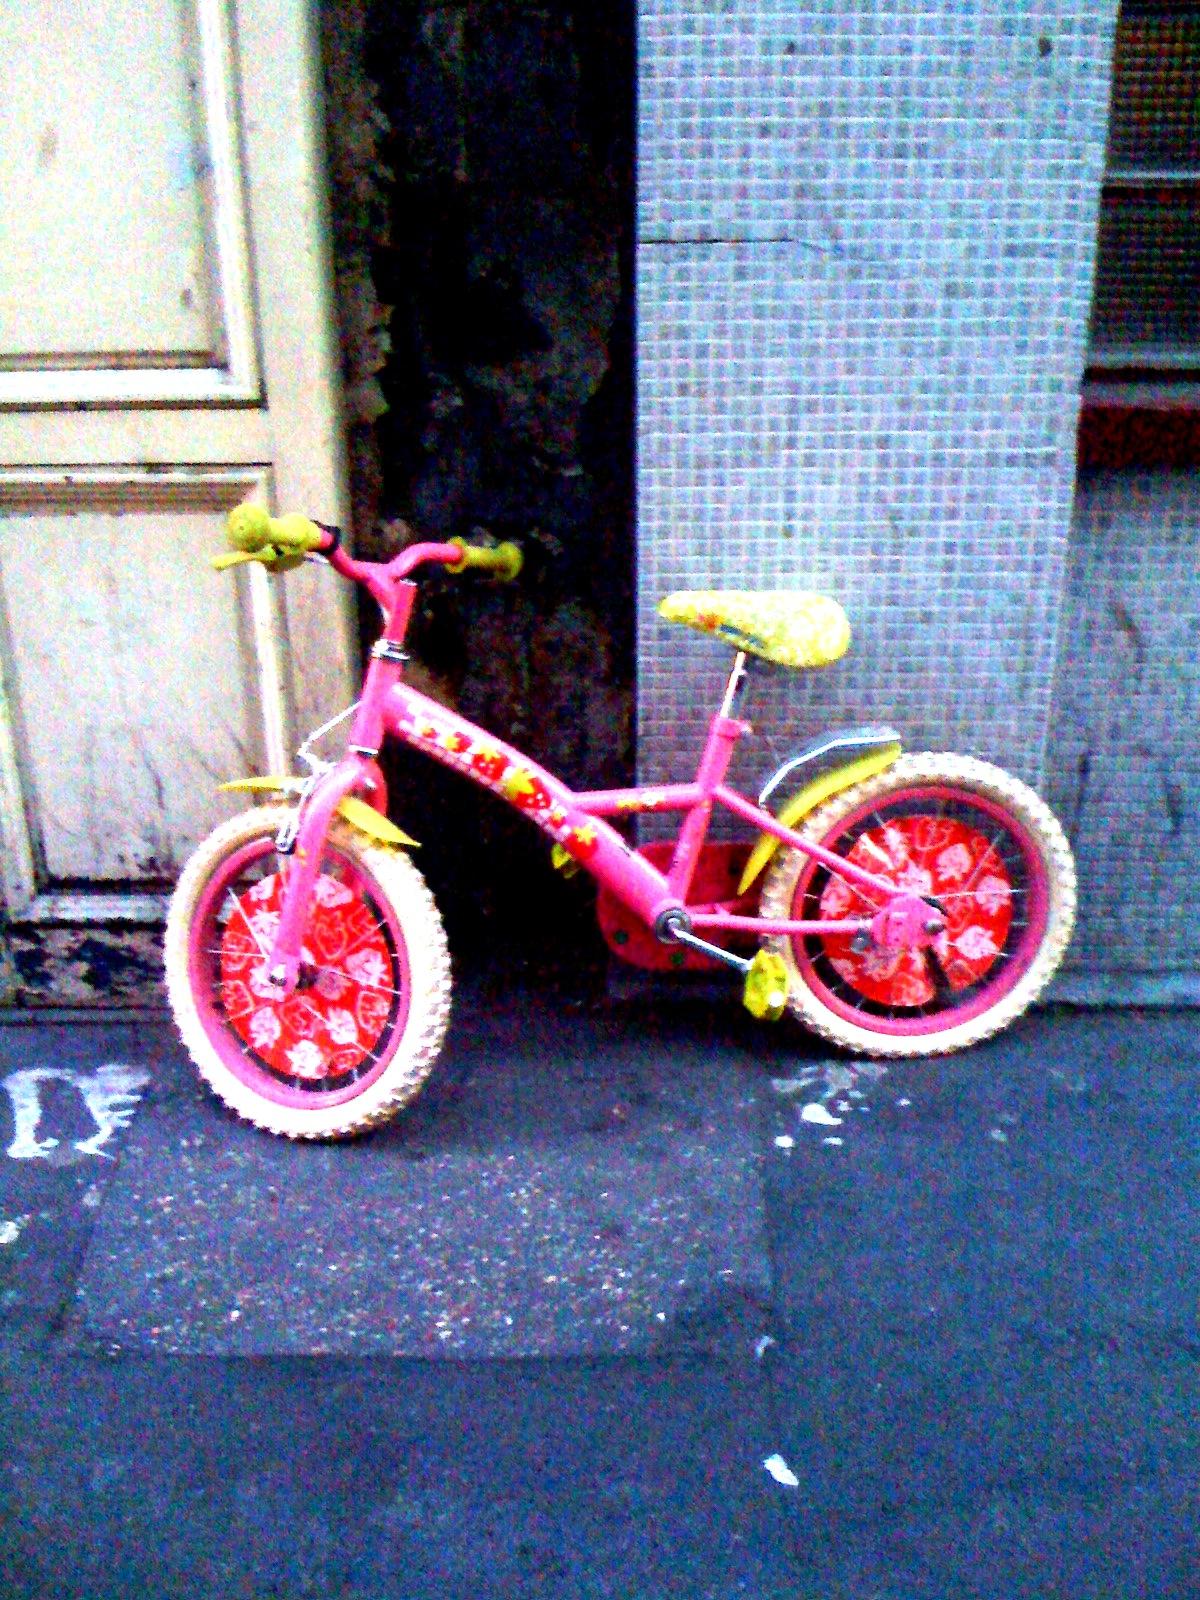 la bicyclette rose une bicyclette rose abandonn e sur un flickr photo sharing. Black Bedroom Furniture Sets. Home Design Ideas